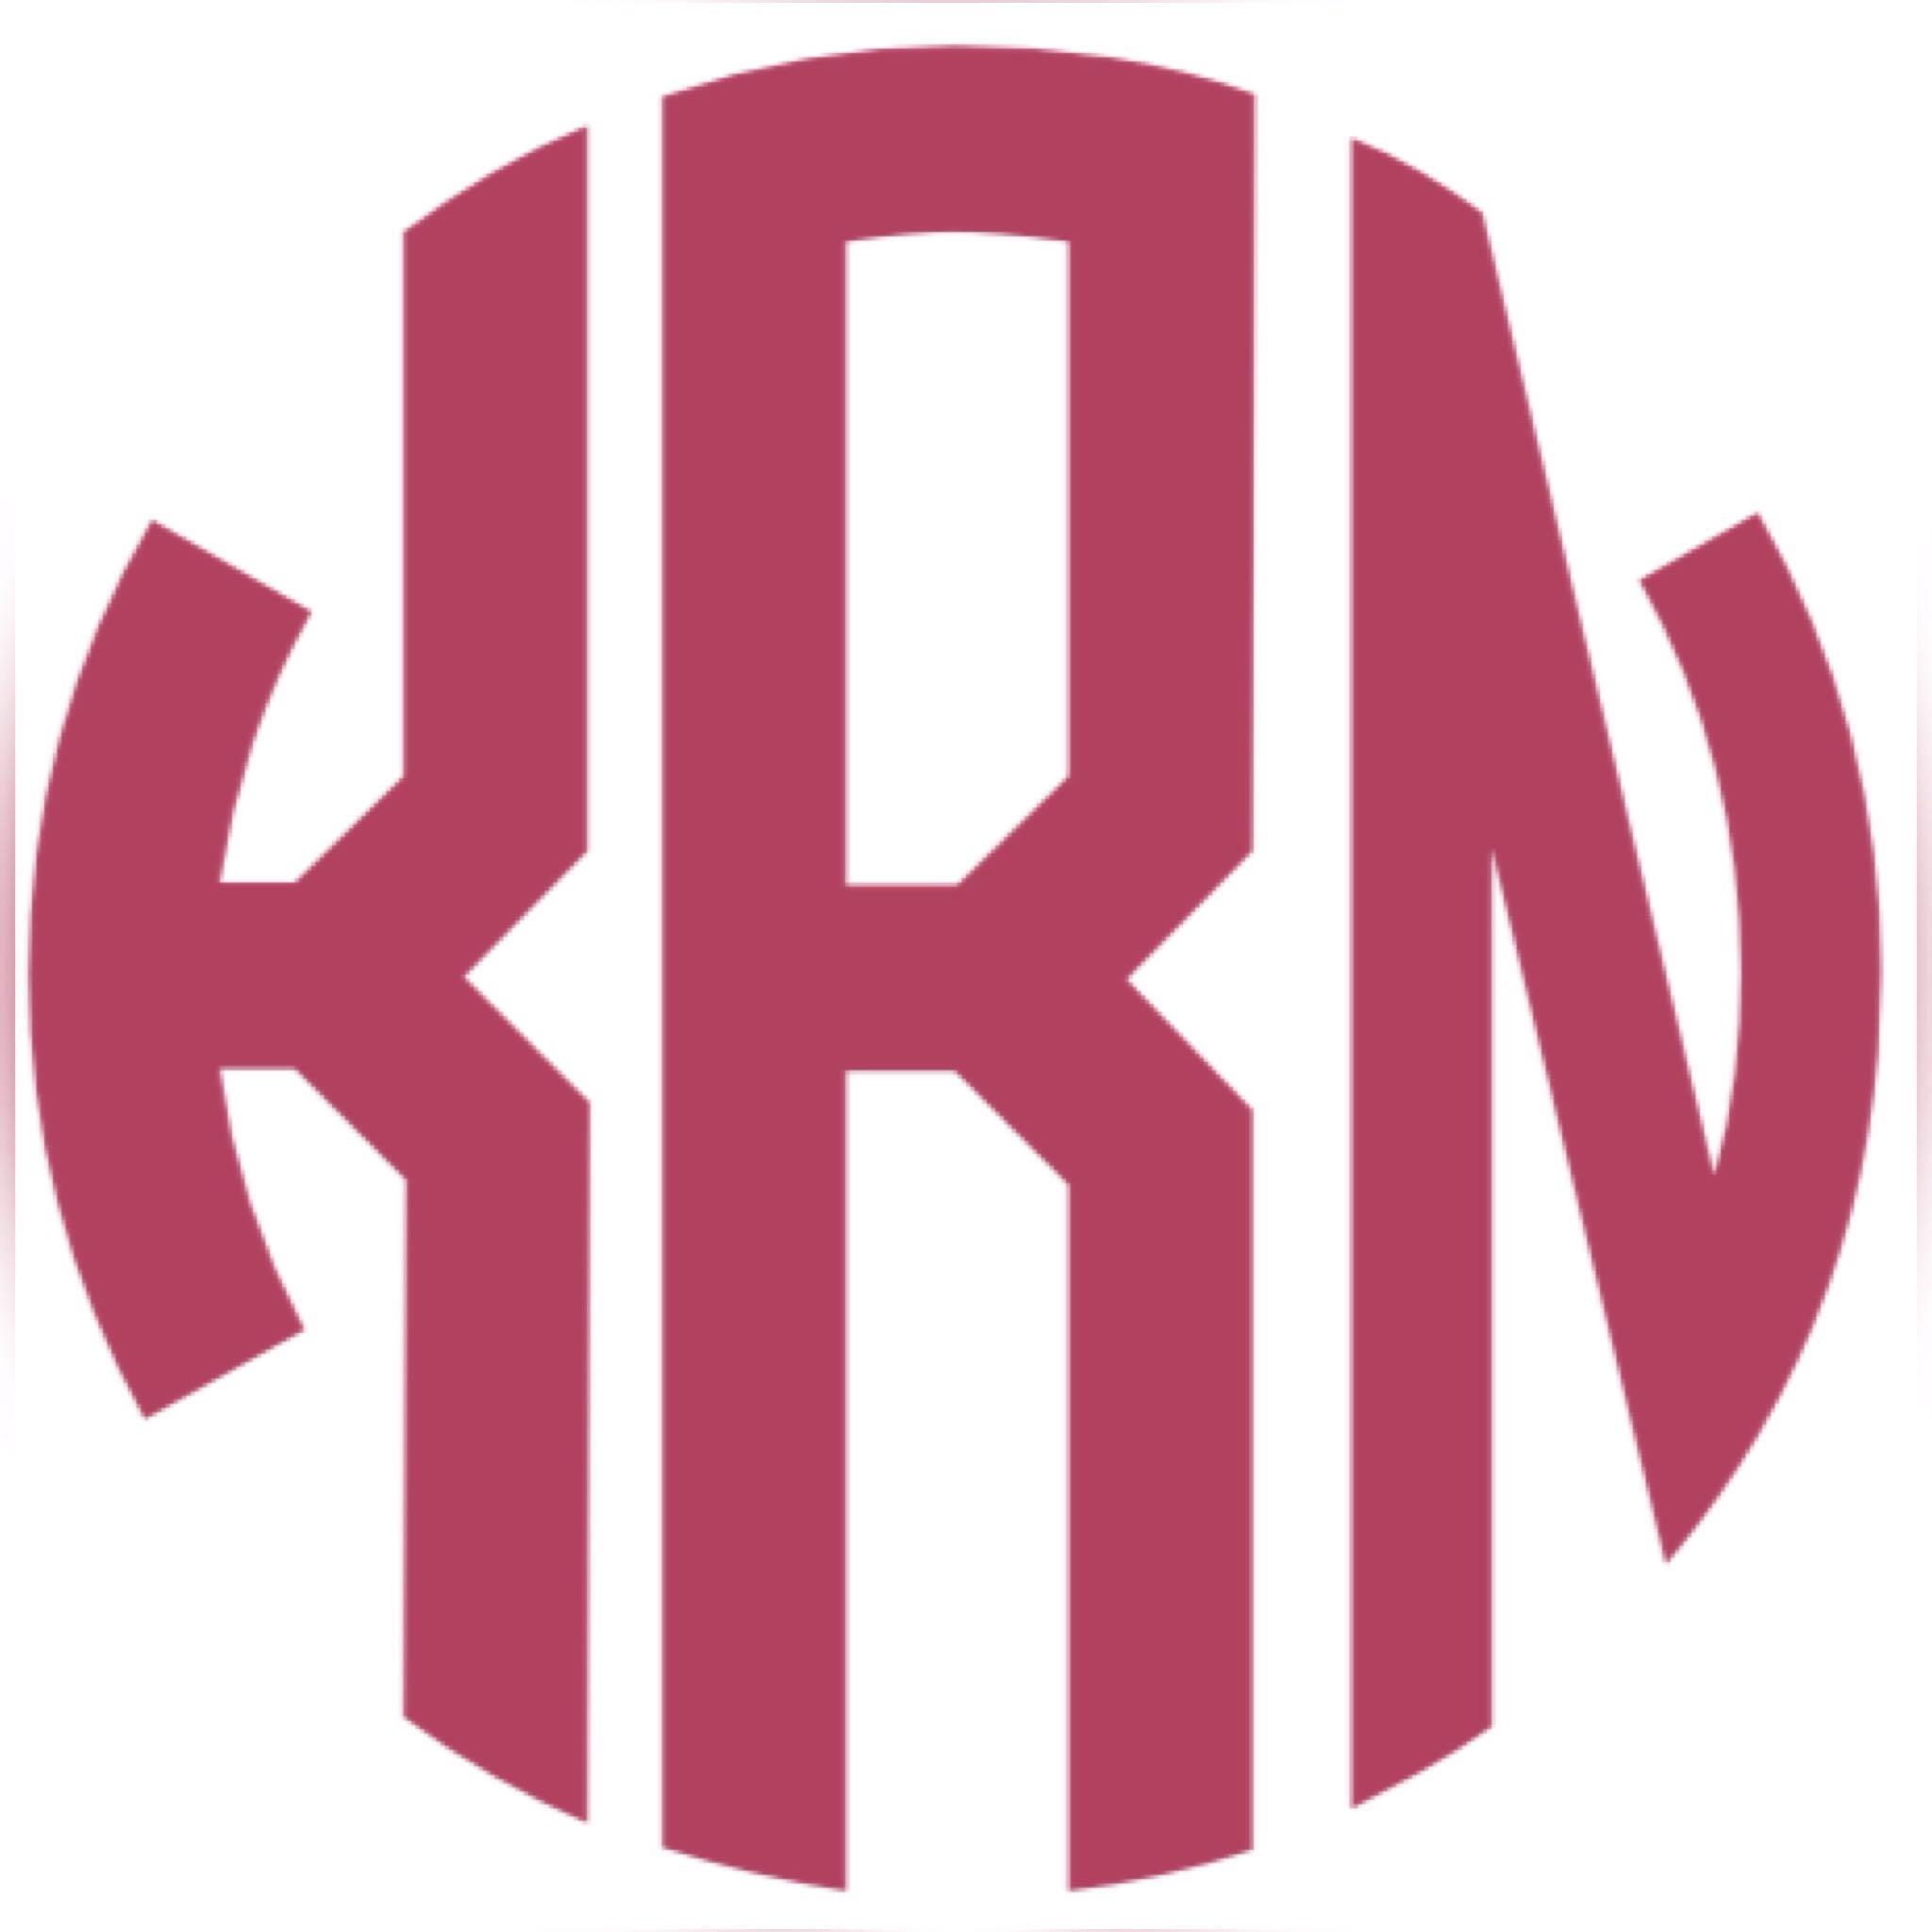 _krn.store_